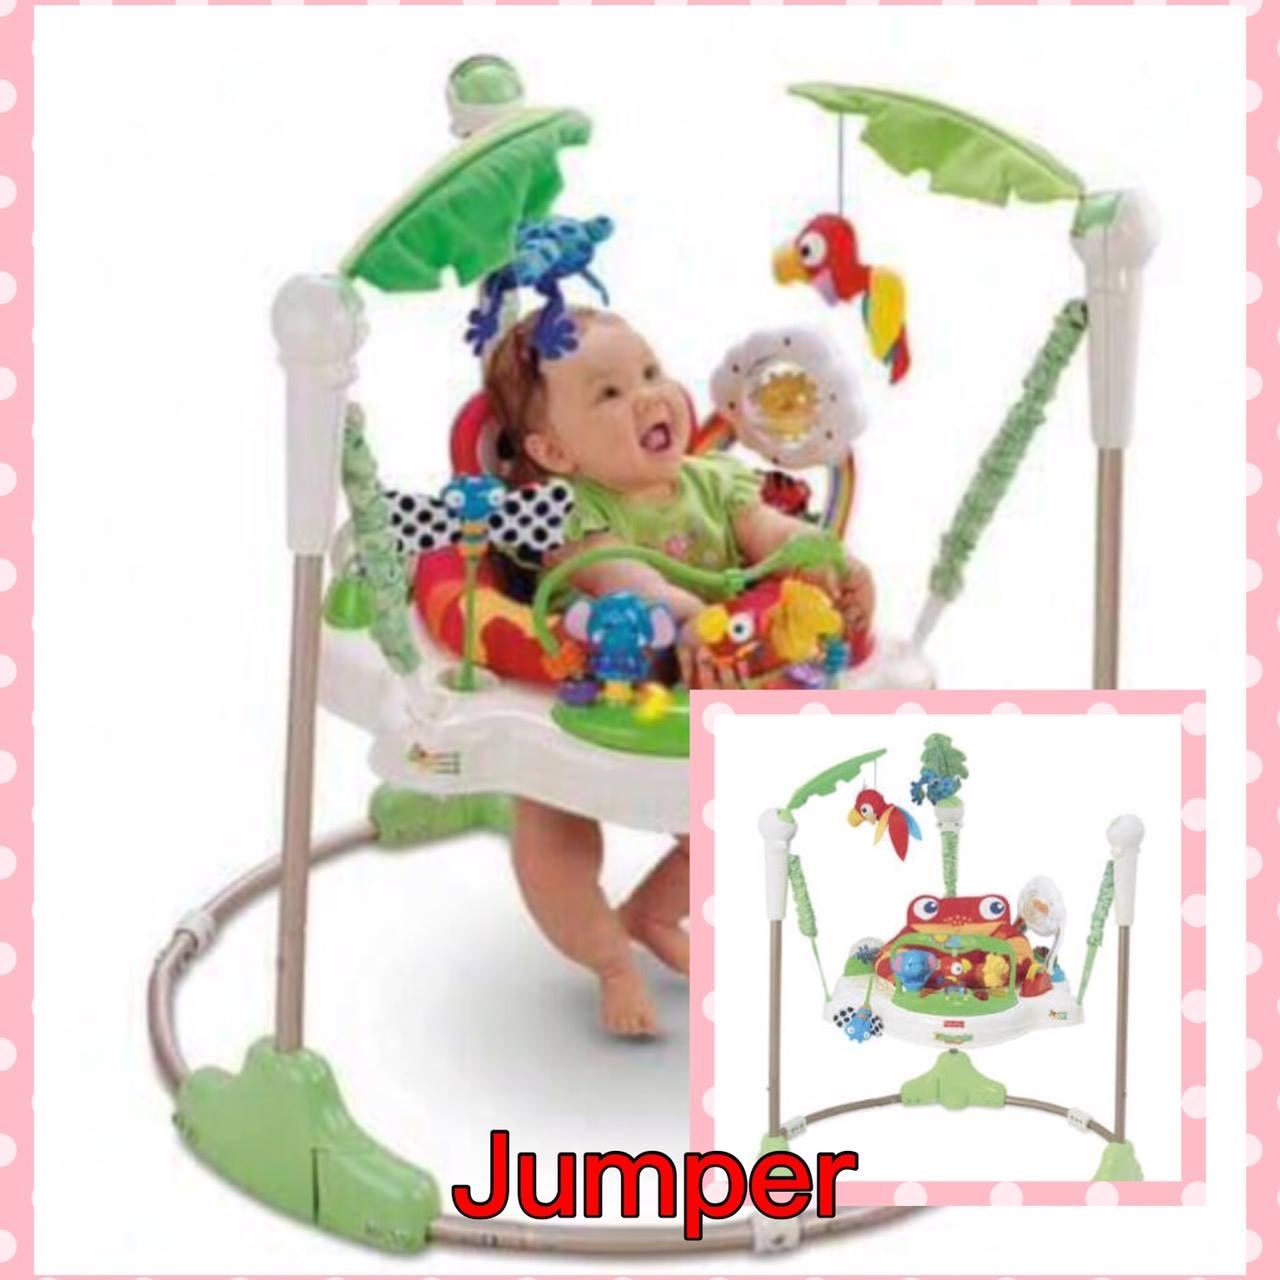 Baby Walker เก้าอี้กระโดด 360 องศา